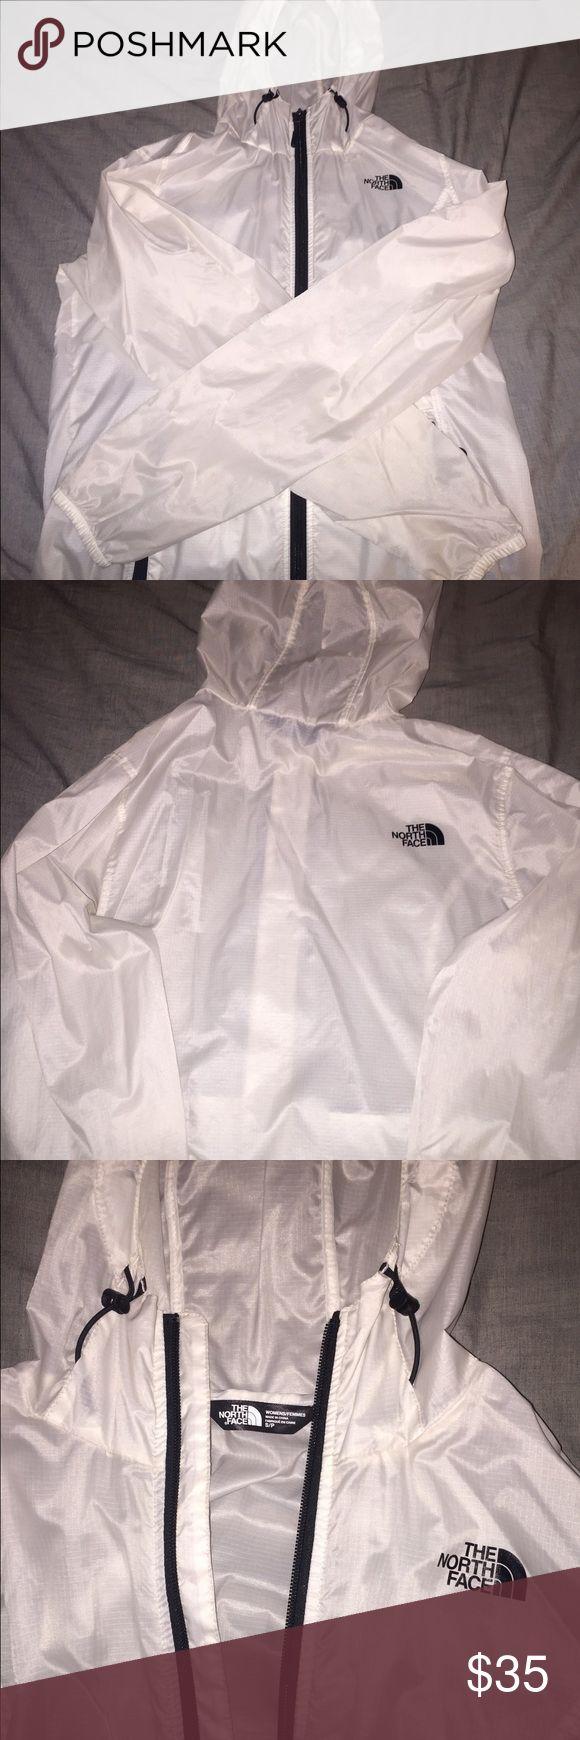 North Face Windbreaker/Rainjacket White/see through North Face, size small. The North Face Jackets & Coats